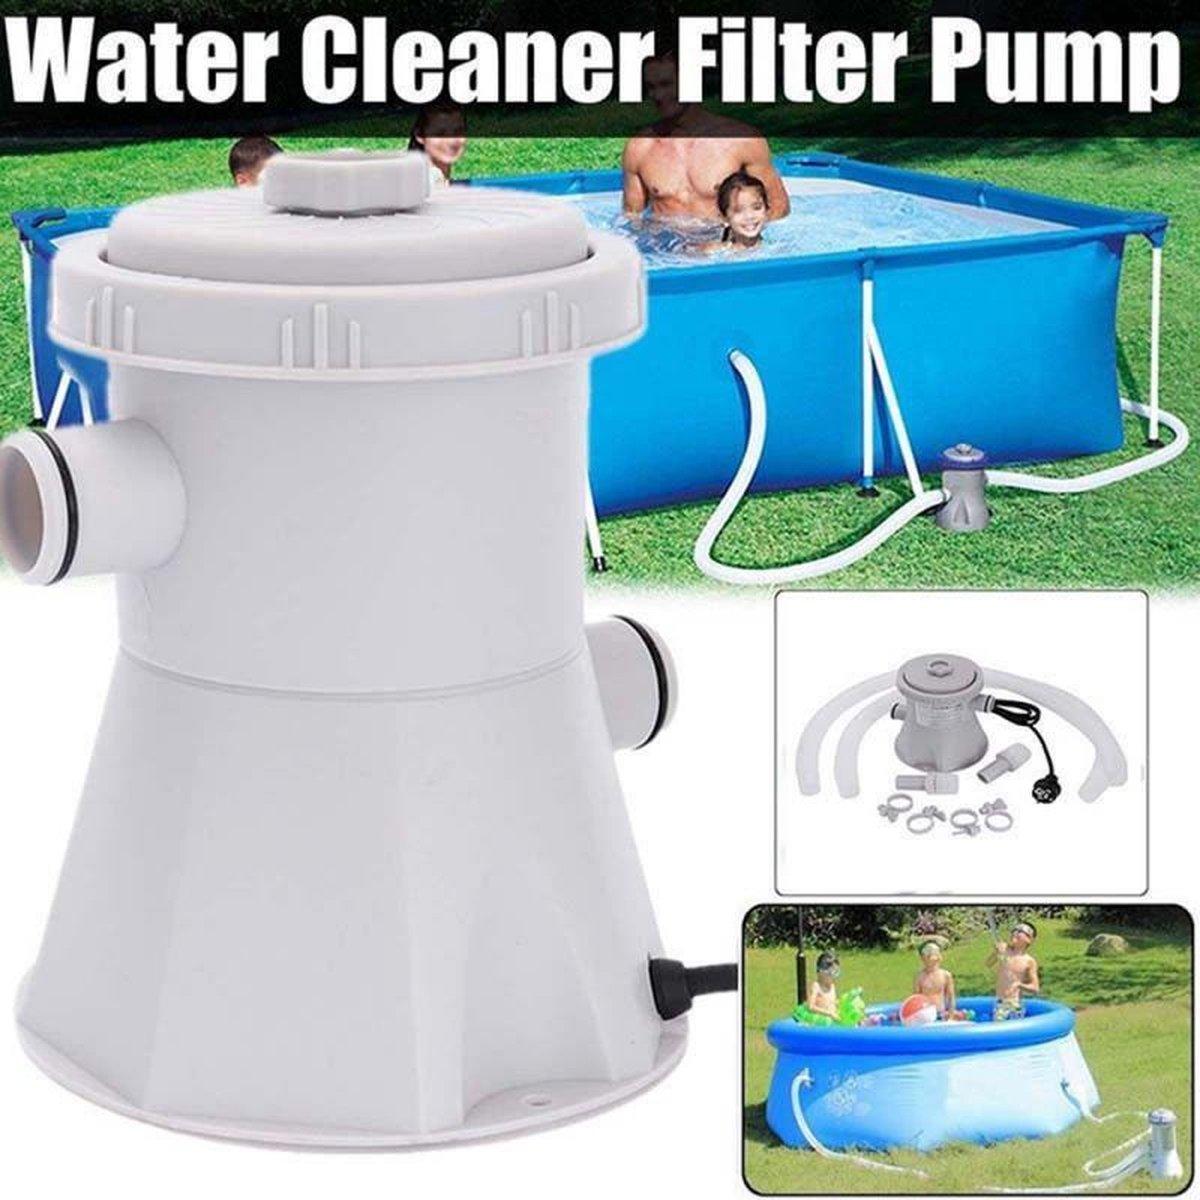 TBG 220V Elektrische Zwembad Filter Pomp Zwembad Pomp En Filter Kit, Zwembad Pomp, Peuterbad Pomp Water